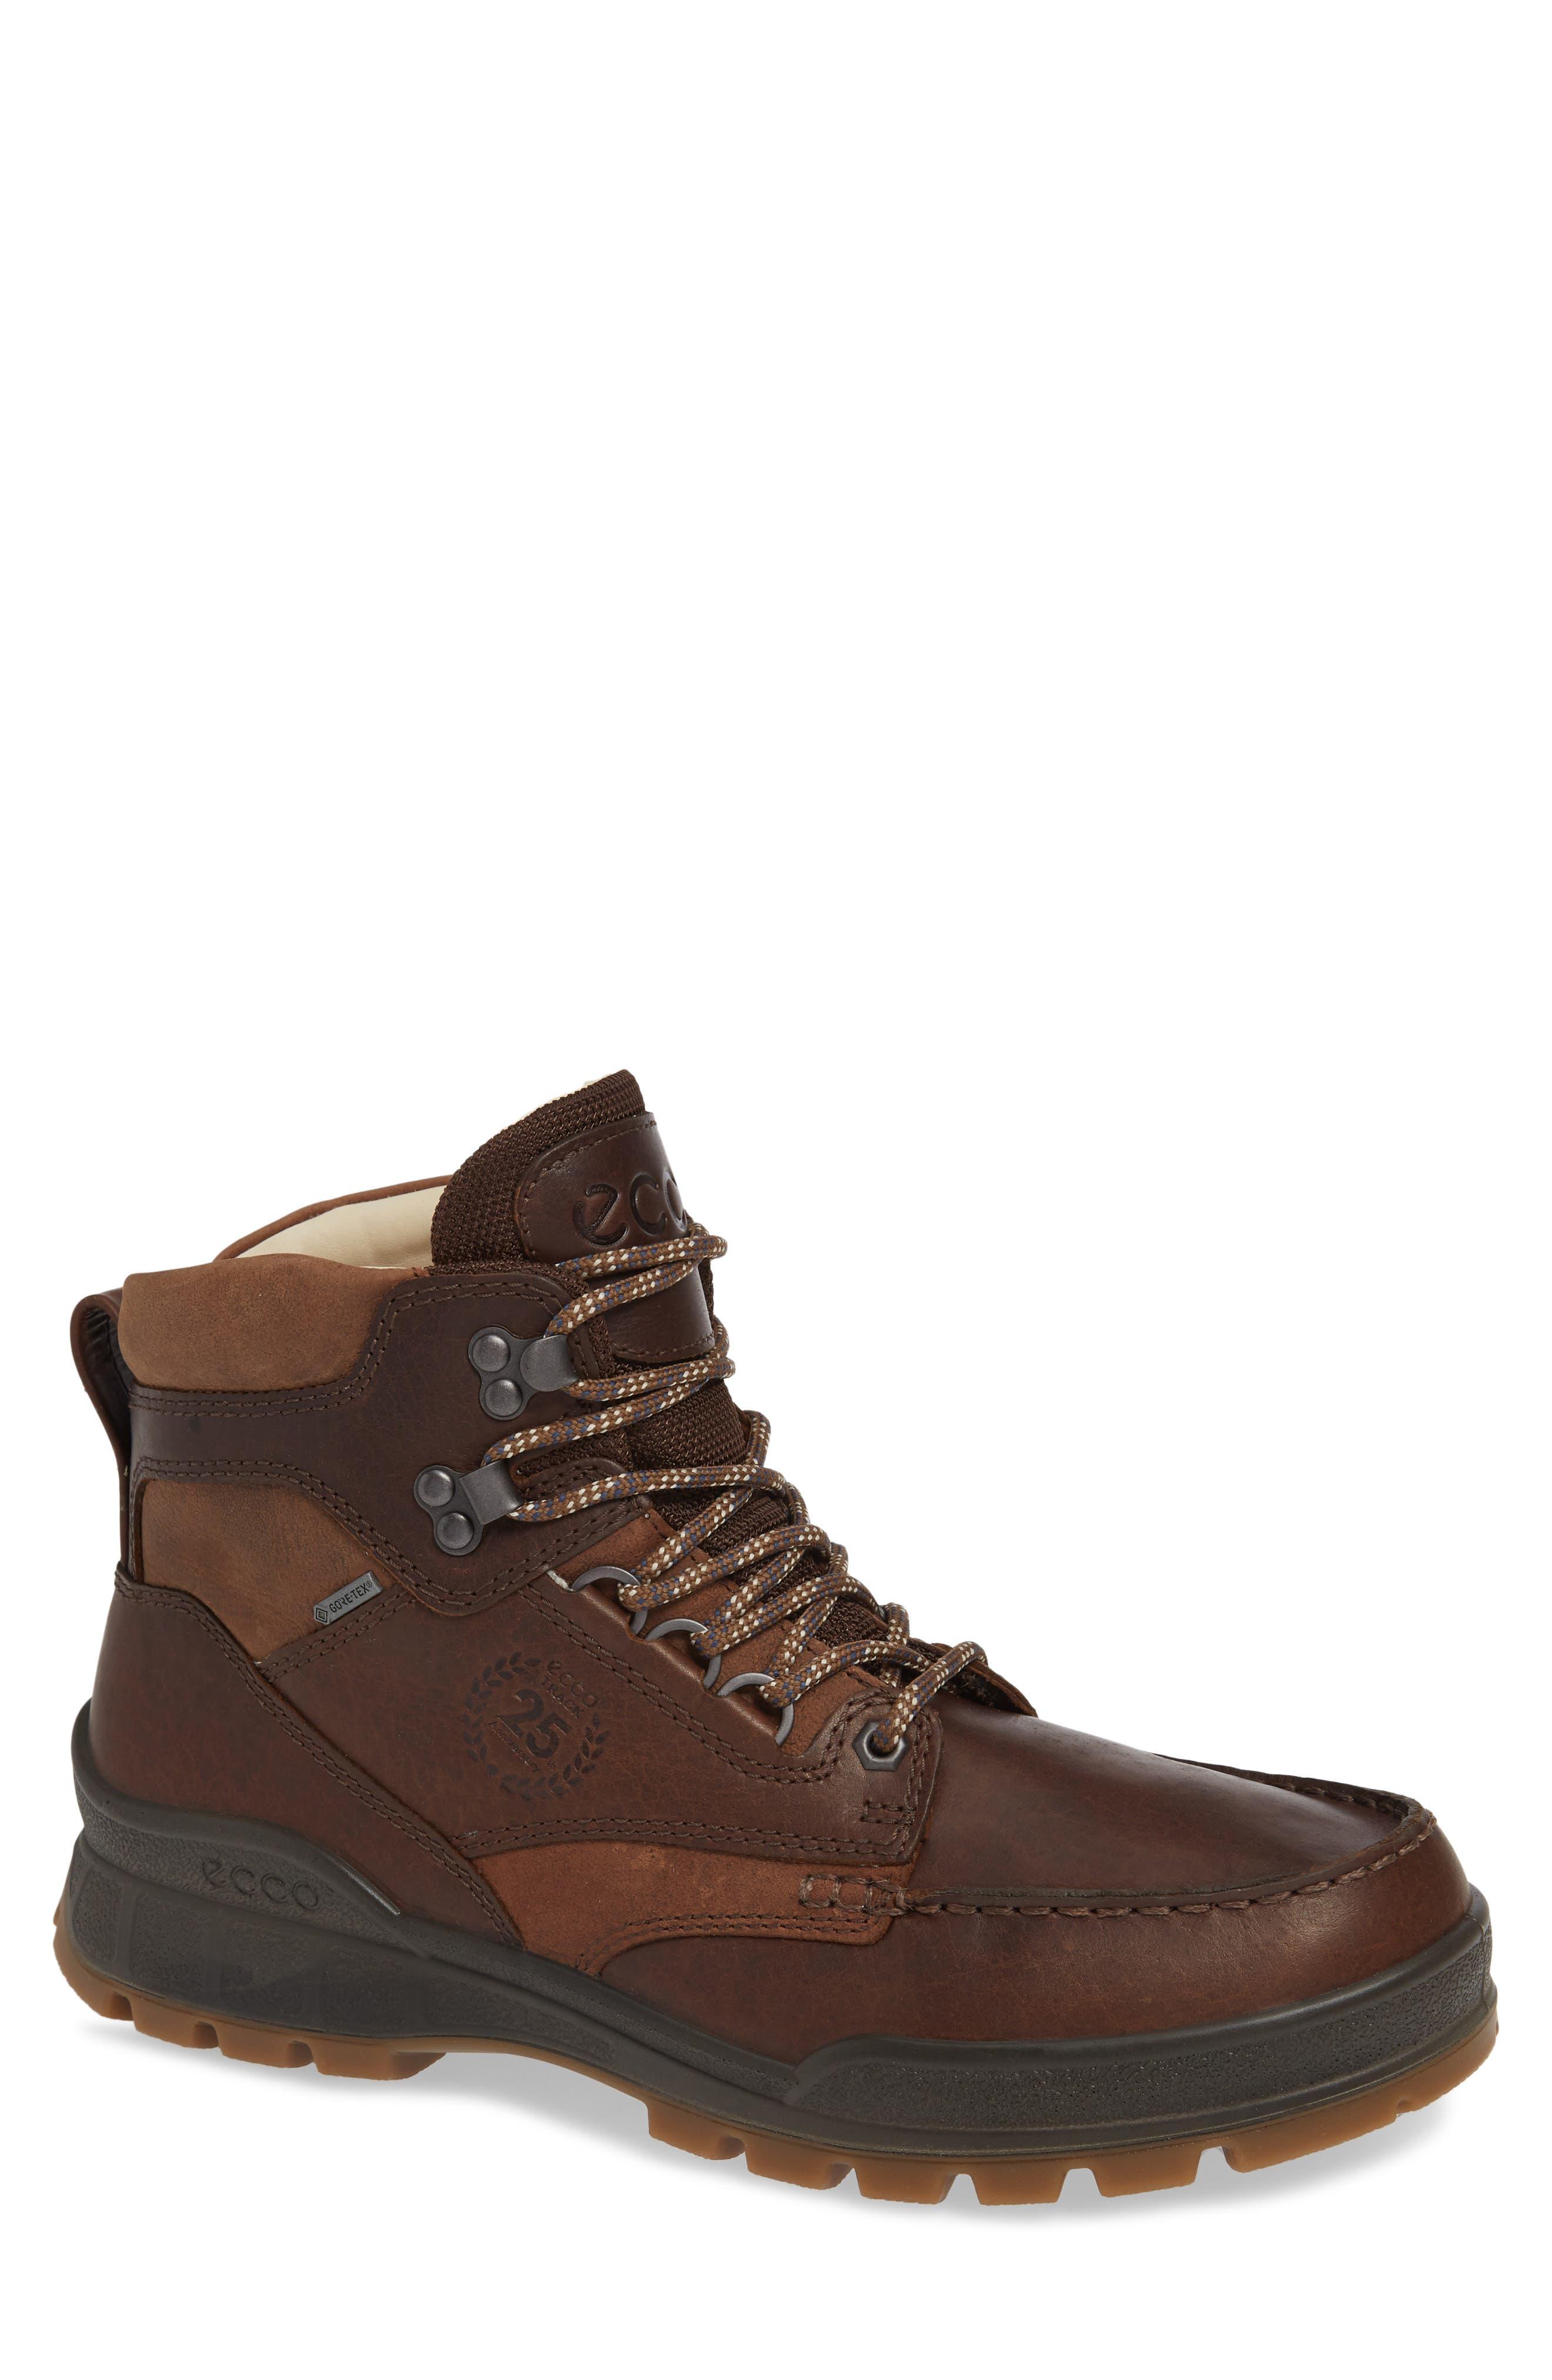 Ecco Track 25 Gore-Tex Moc Toe Waterproof Boot,8.5 - Brown